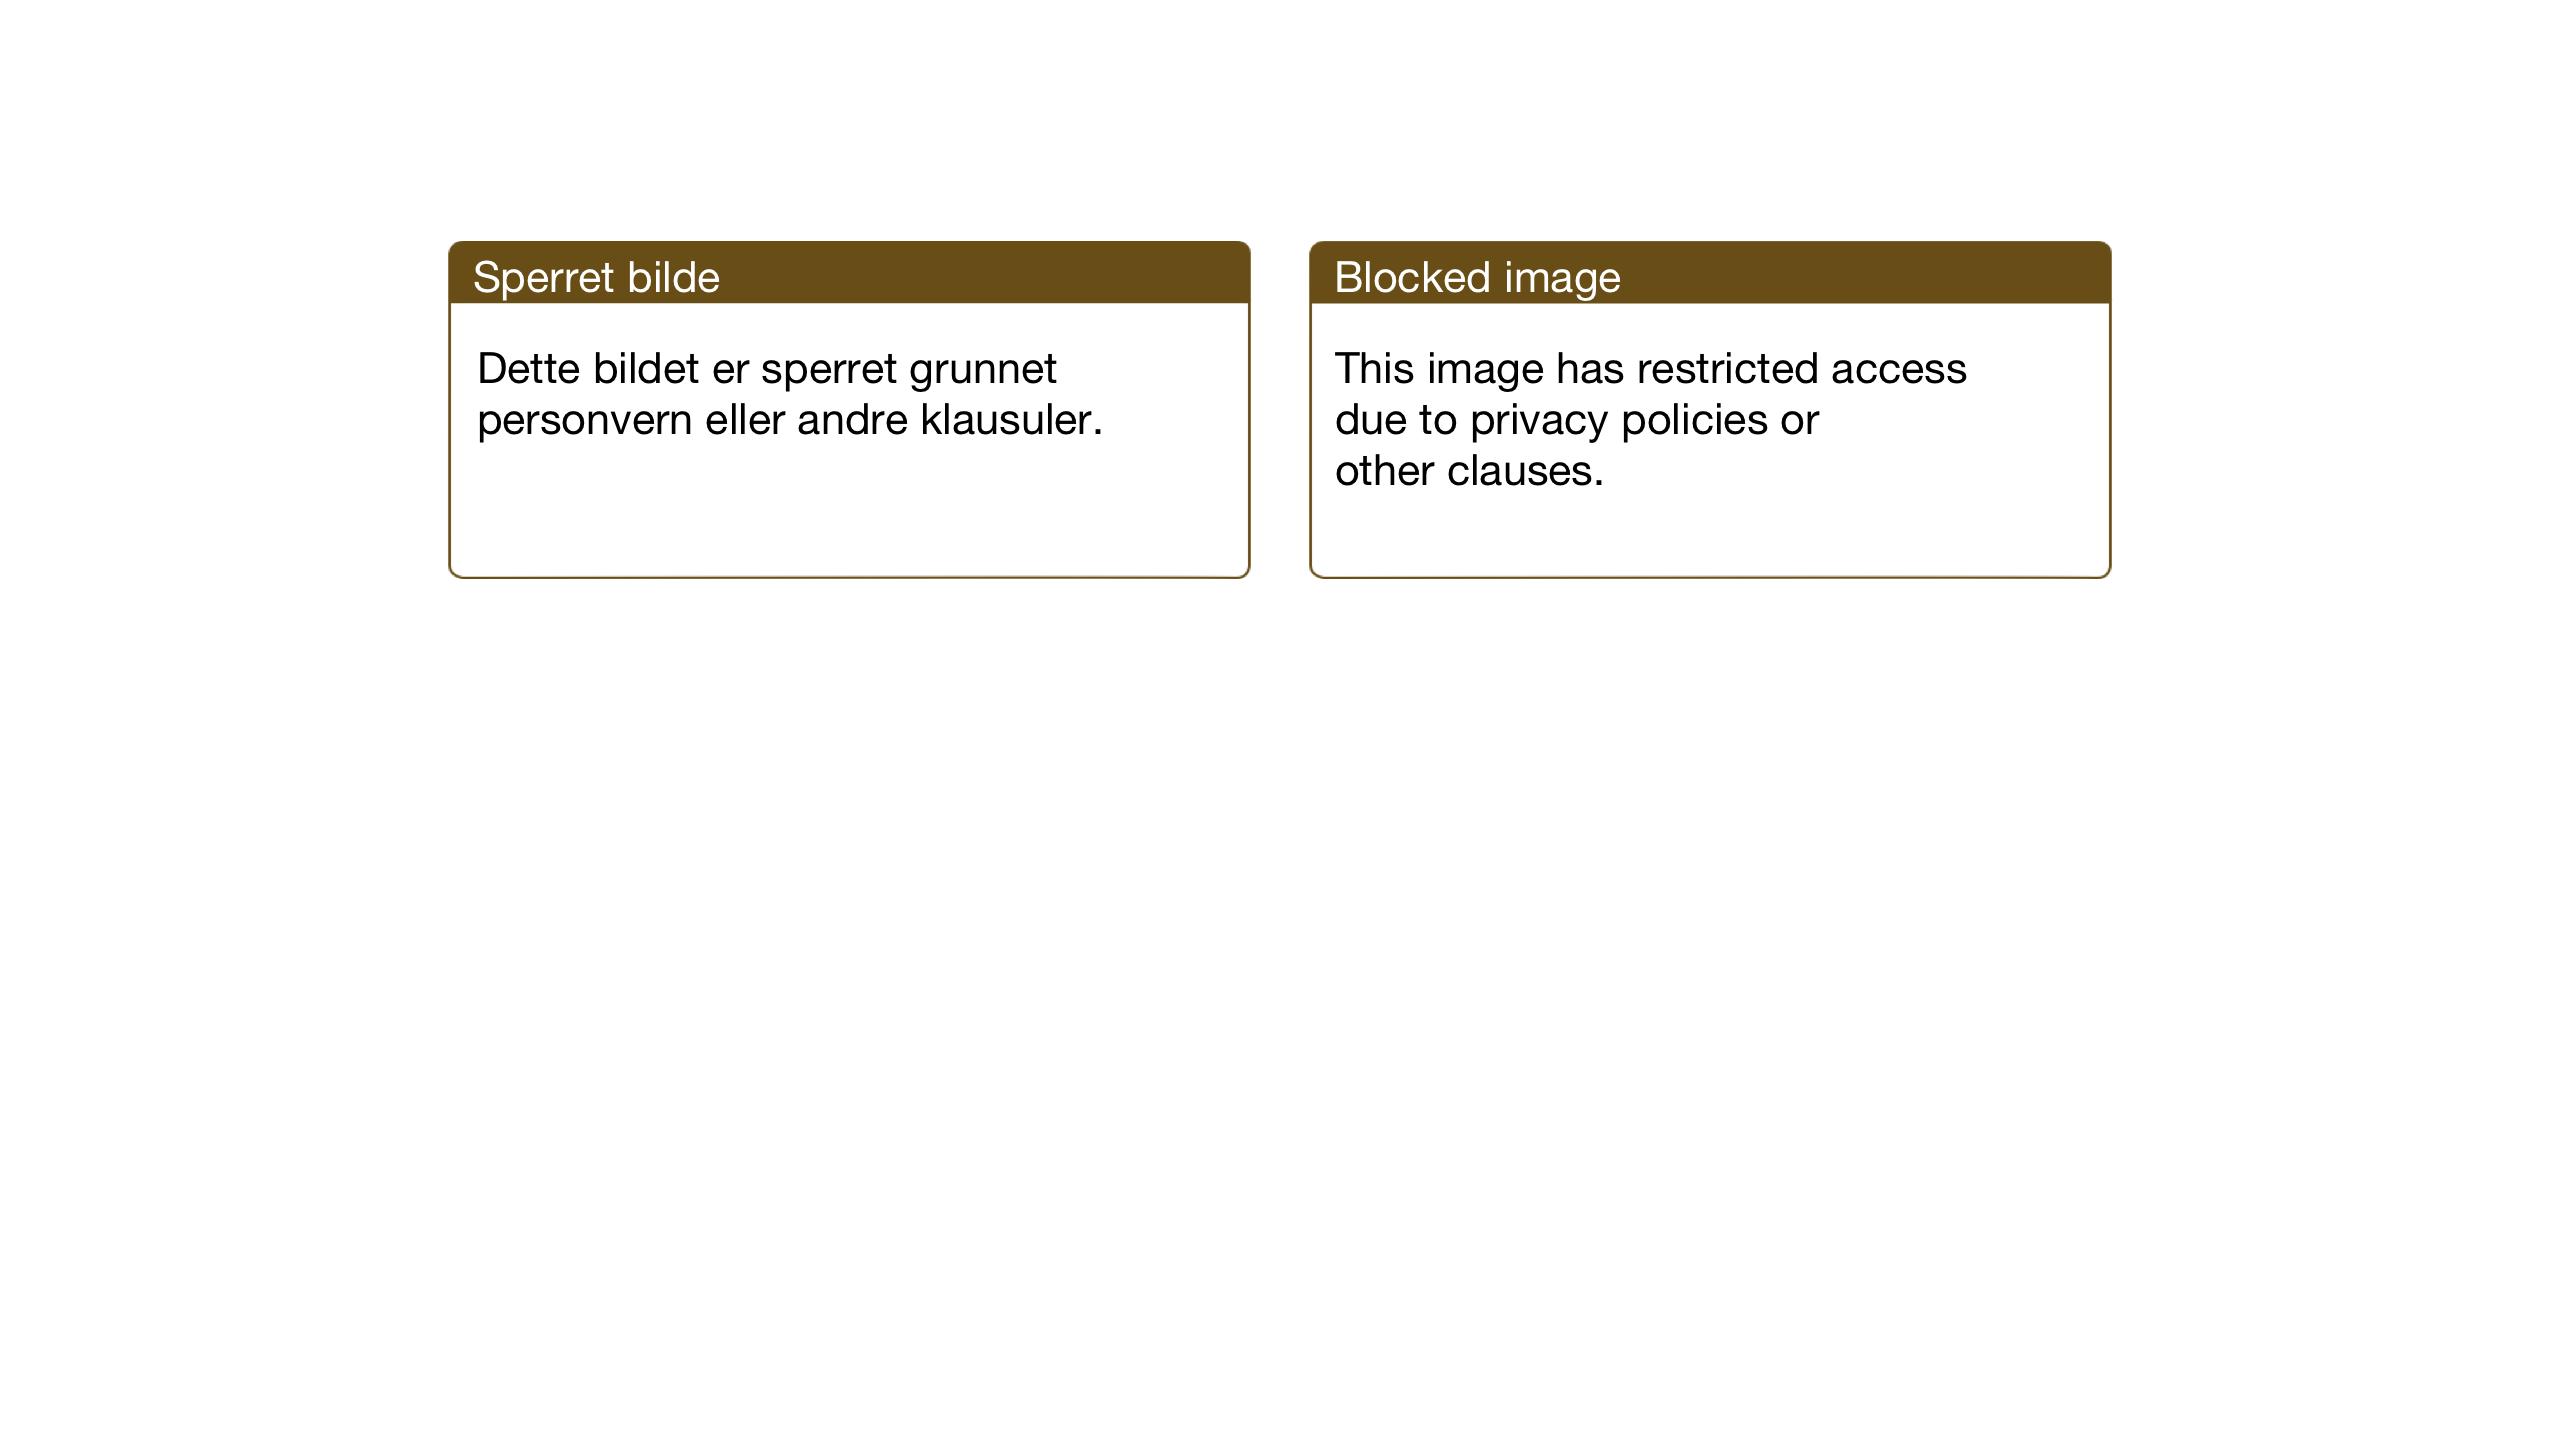 SAH, Vardal prestekontor, H/Ha/Haa/L0018: Ministerialbok nr. 18, 1930-1945, s. 23